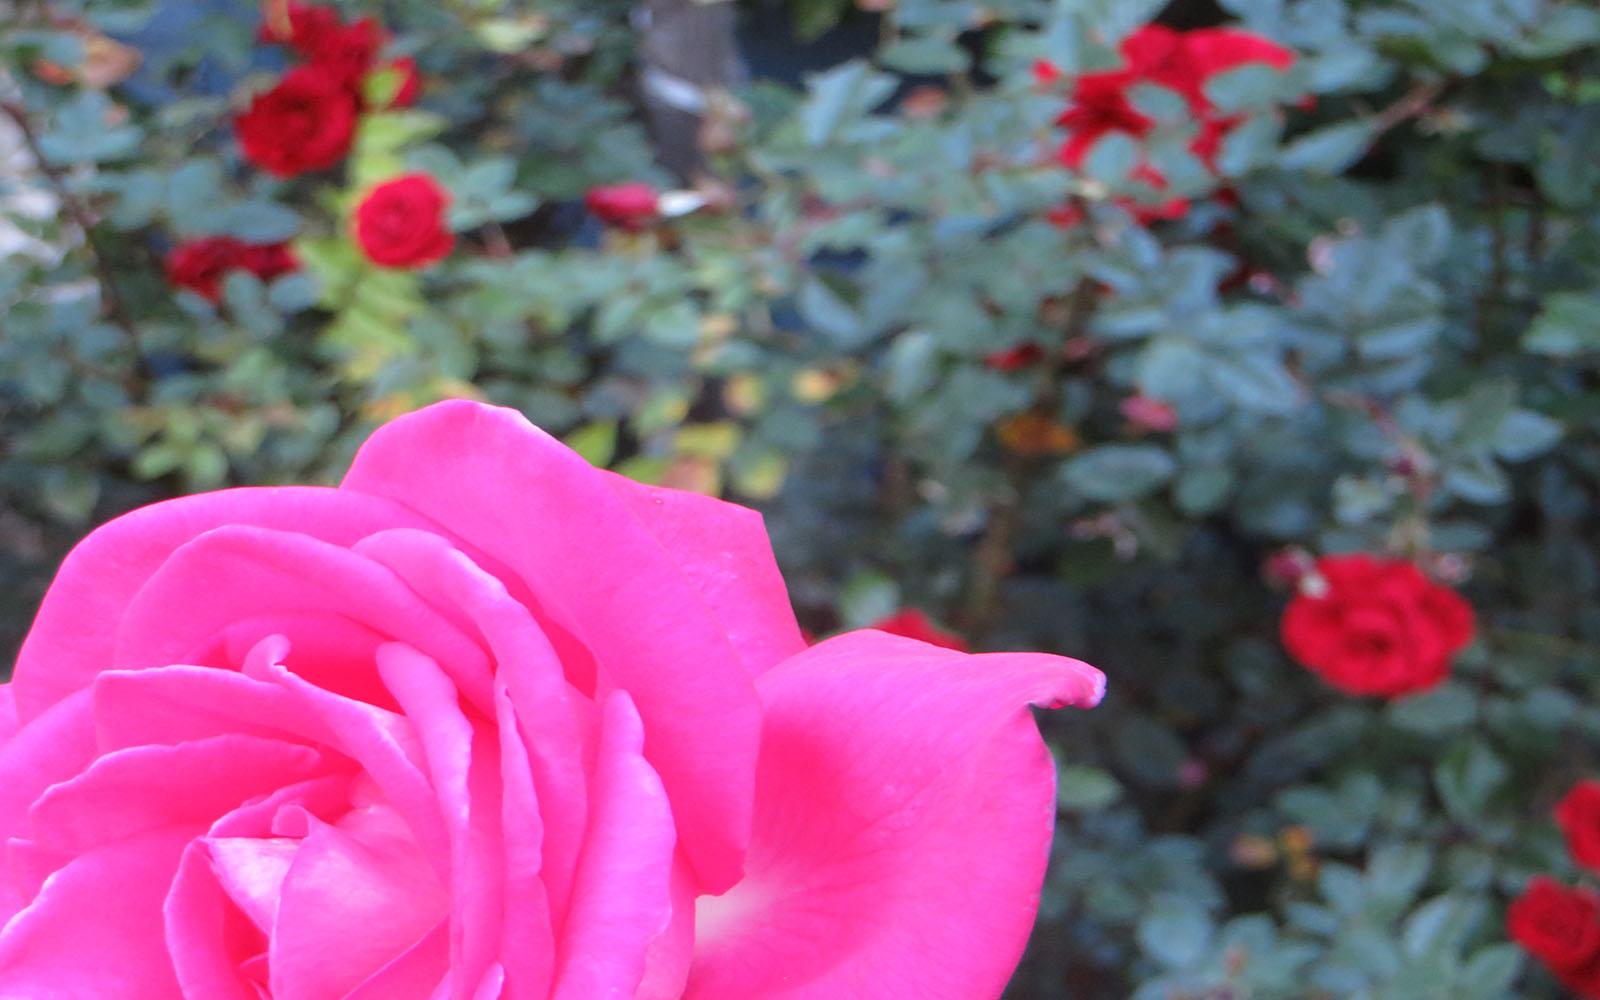 SNAP: Killer Roses